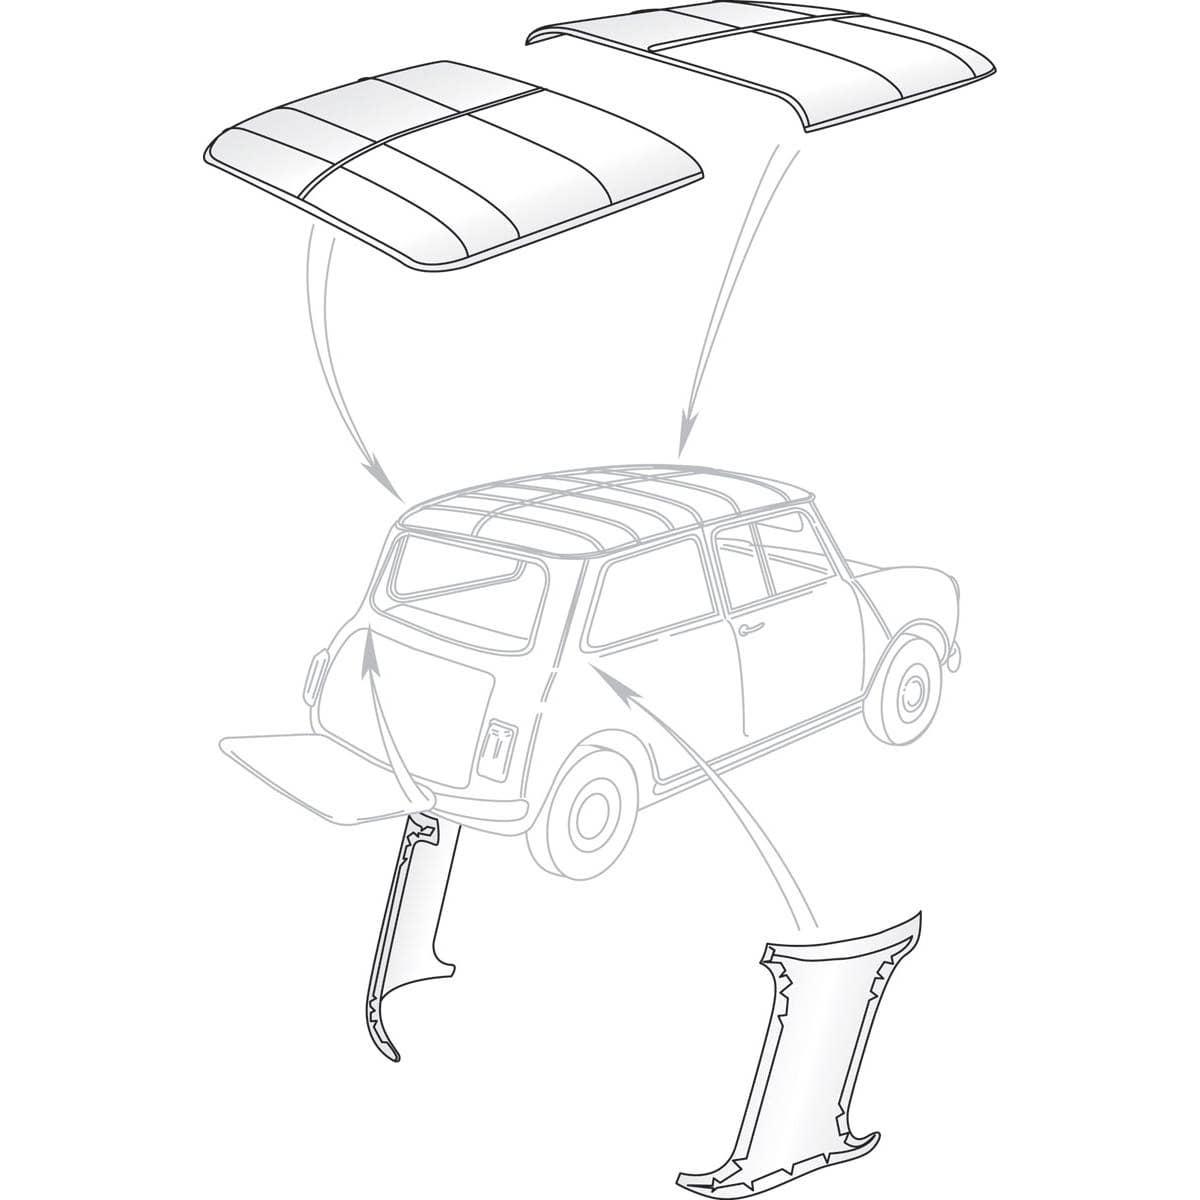 headliner kit mkiii interior trim and fittings upholstery 1959 Oldsmobile Ad headliner kit white mkiii